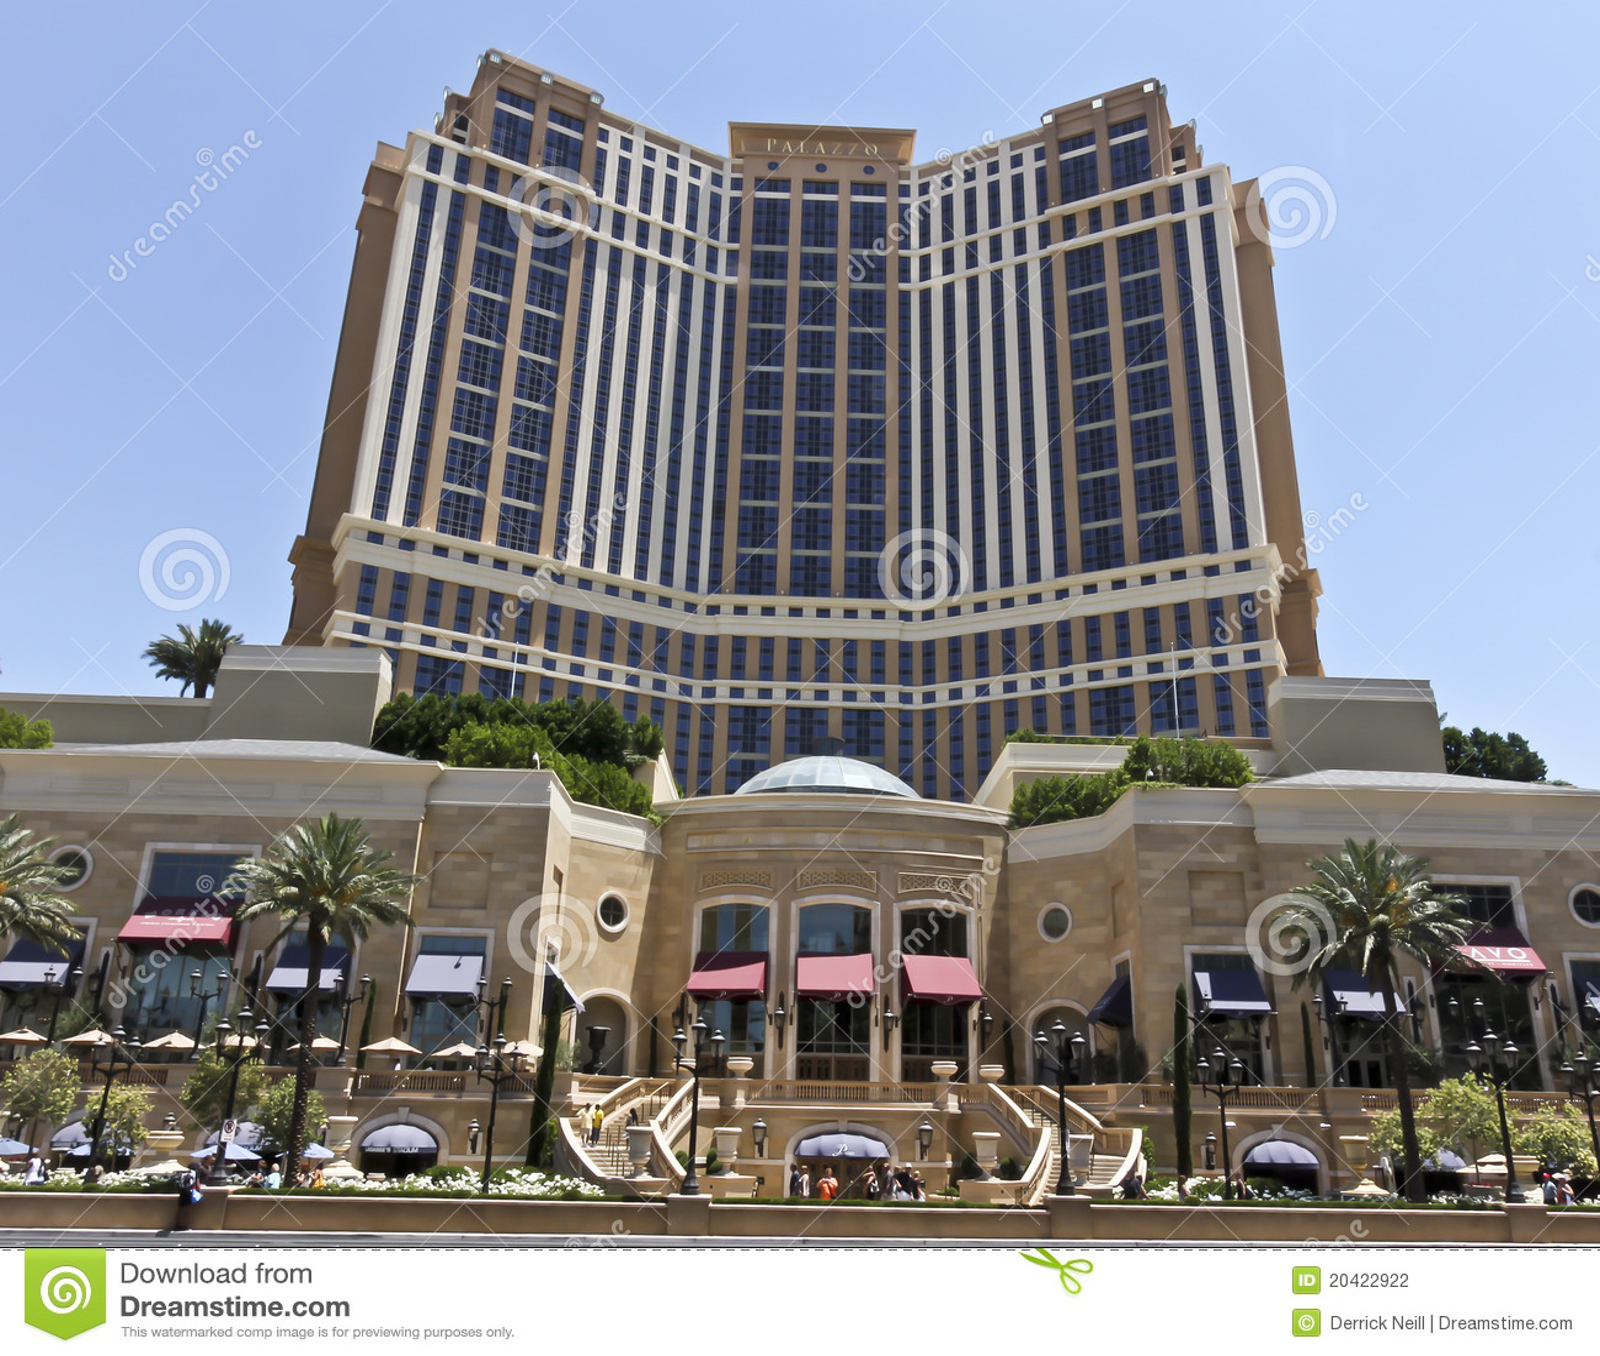 Palazza casino in nevada gambling creates jobs